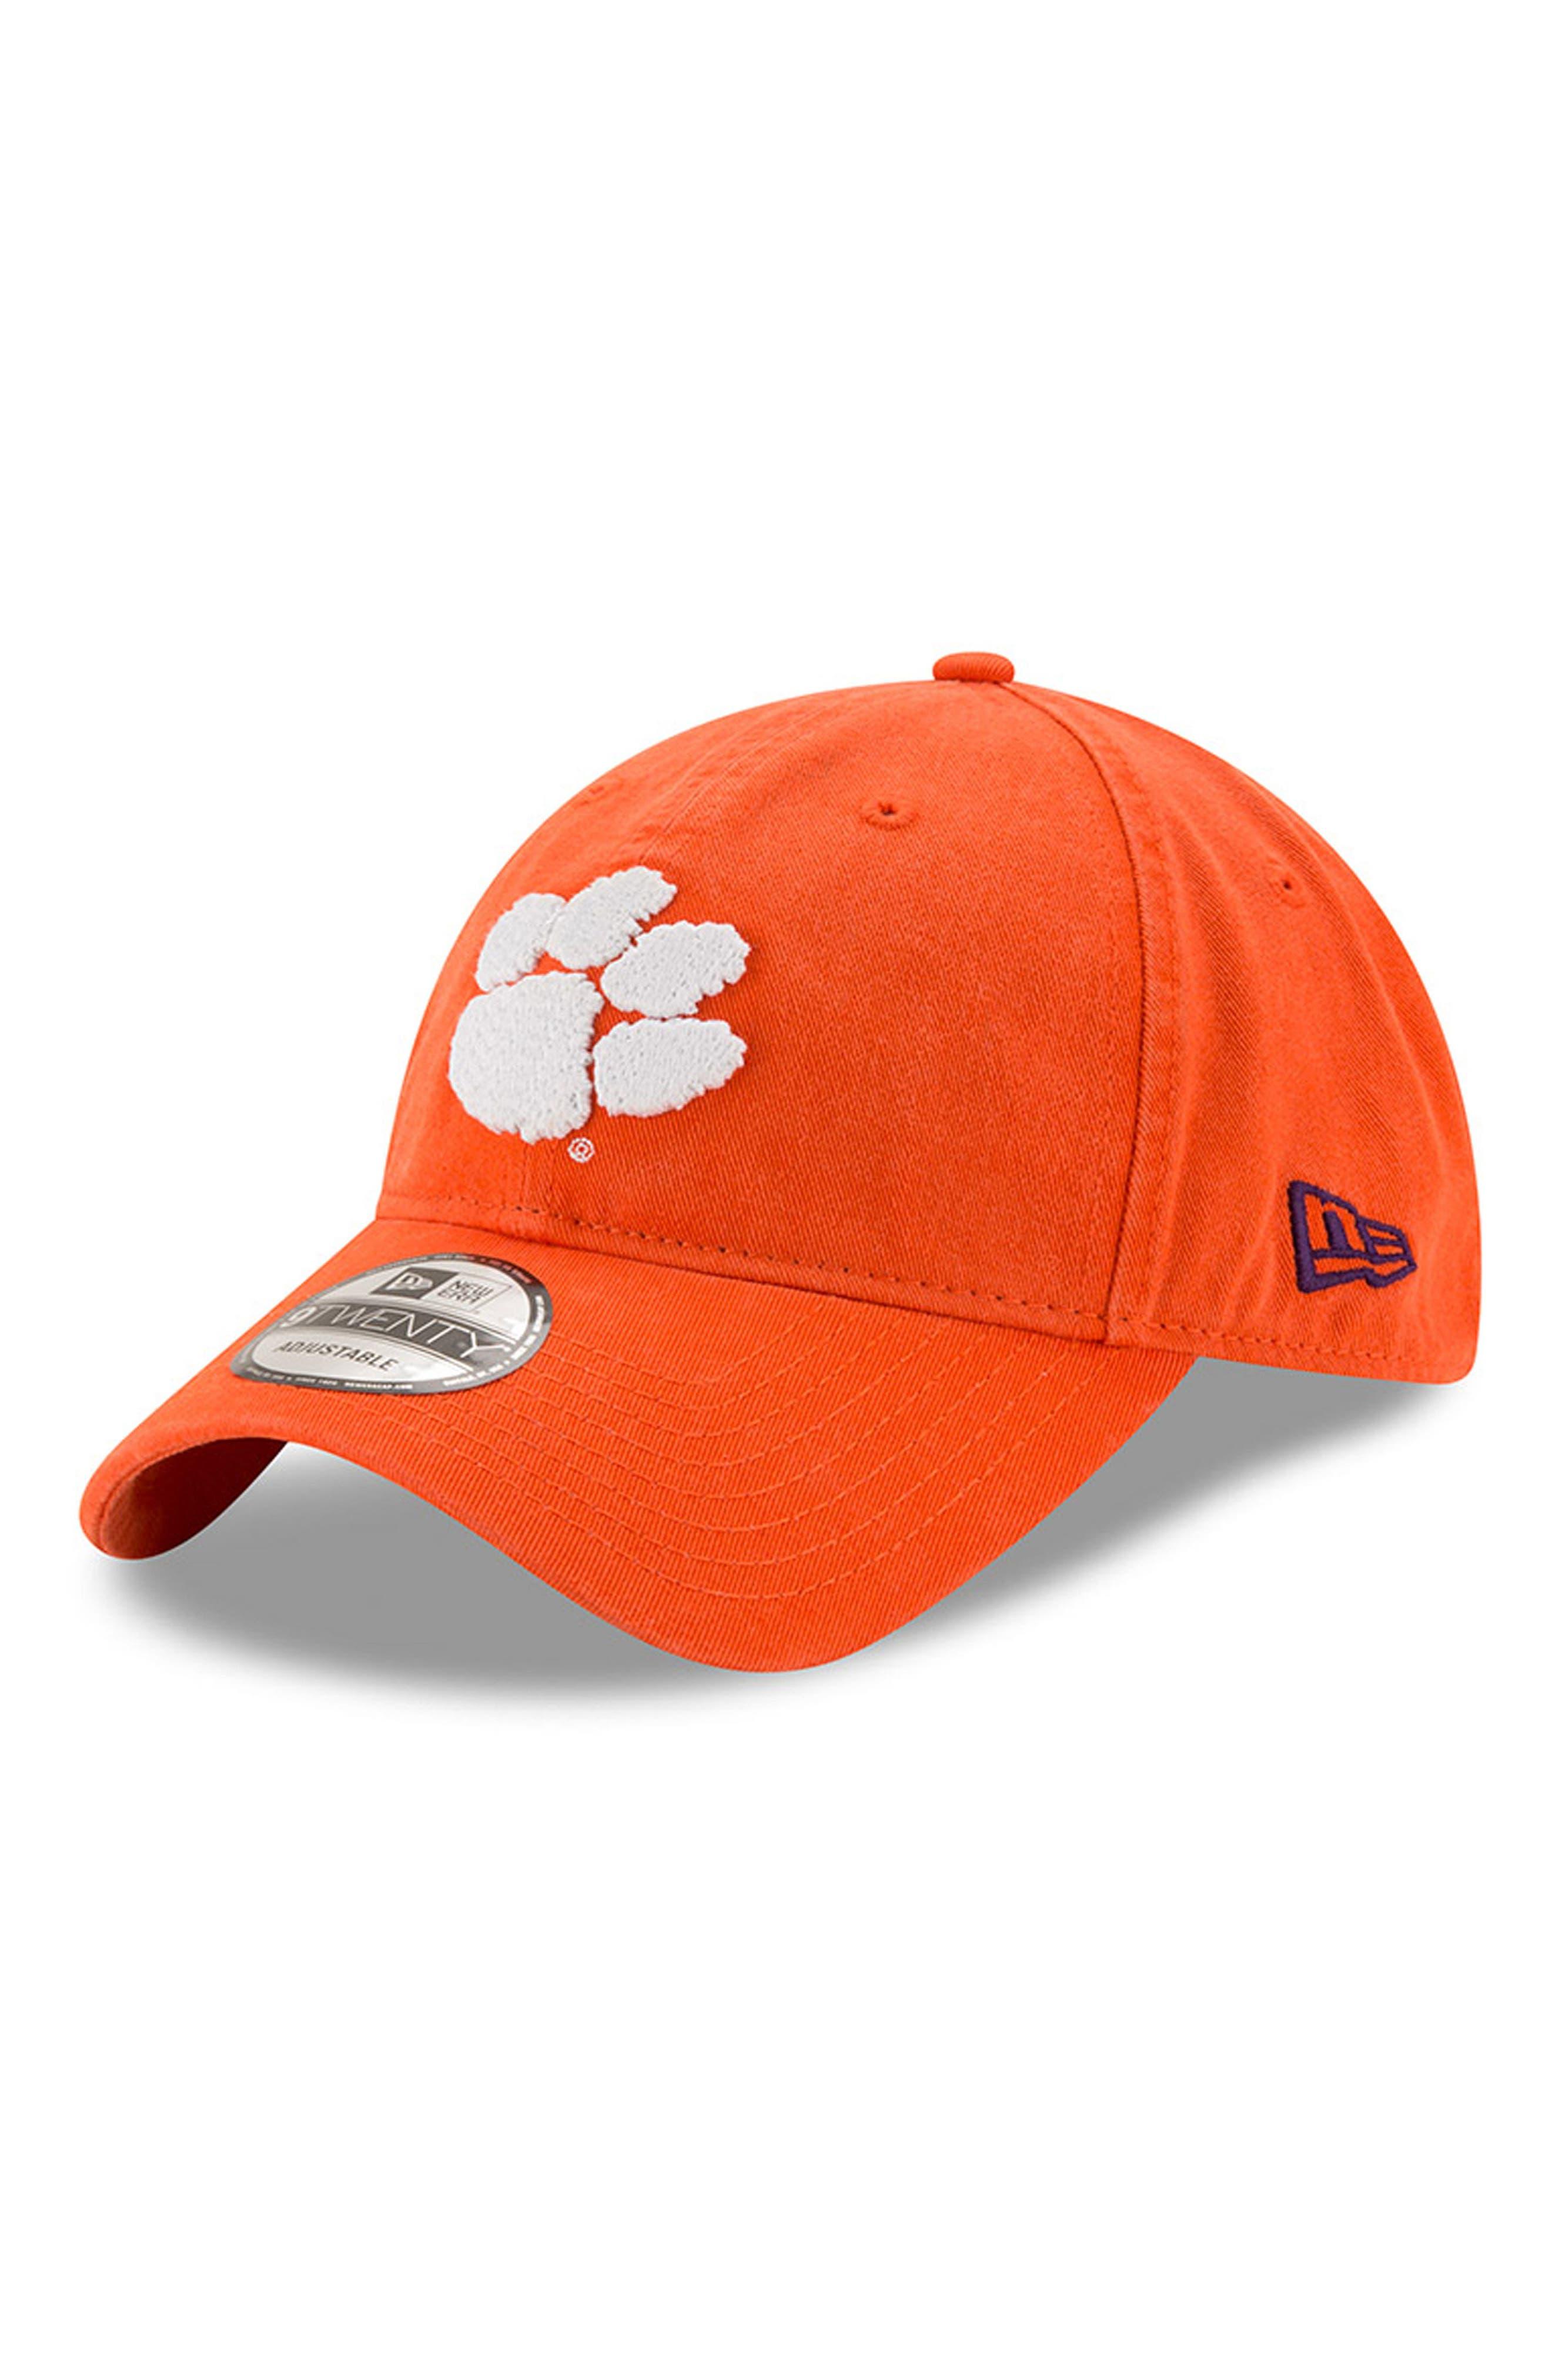 New Era Collegiate Core Classic - Clemson Tigers Baseball Cap